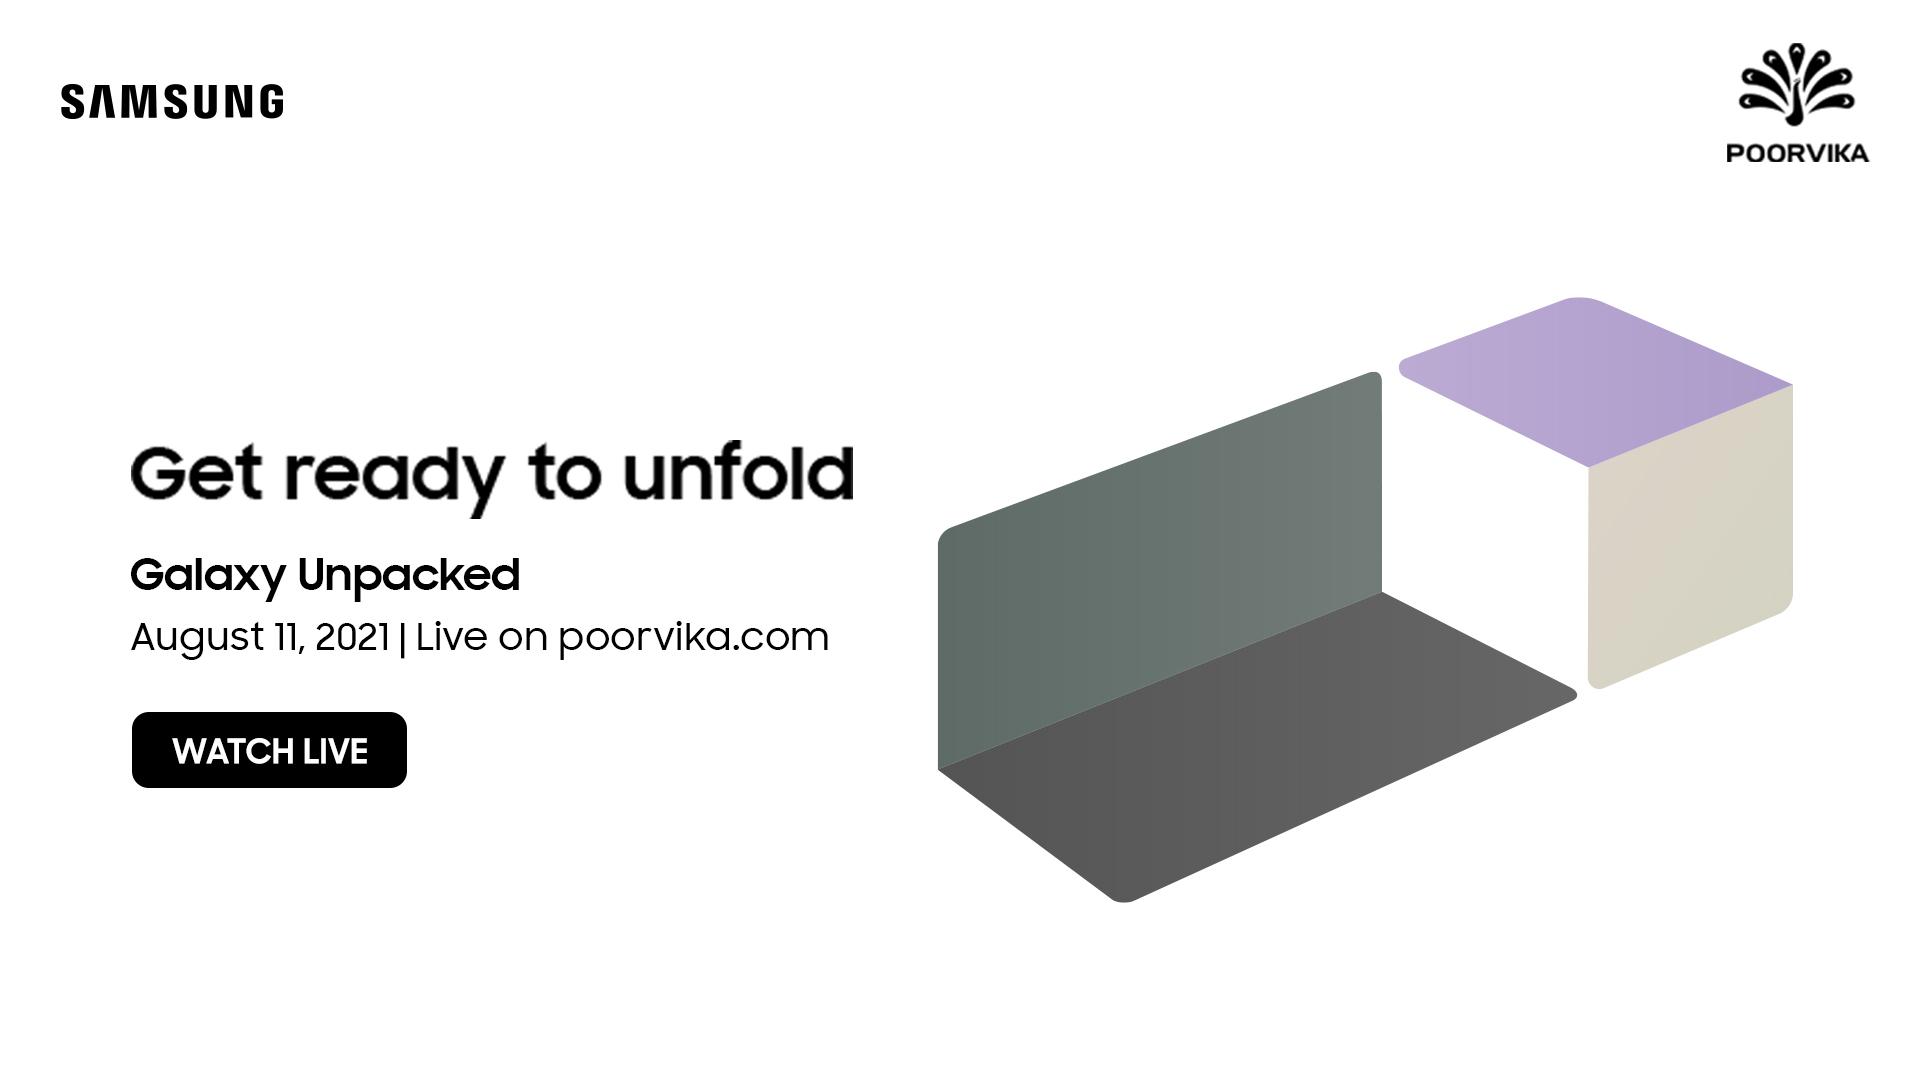 Samsung-galaxy-unpacked-2021-poorvika